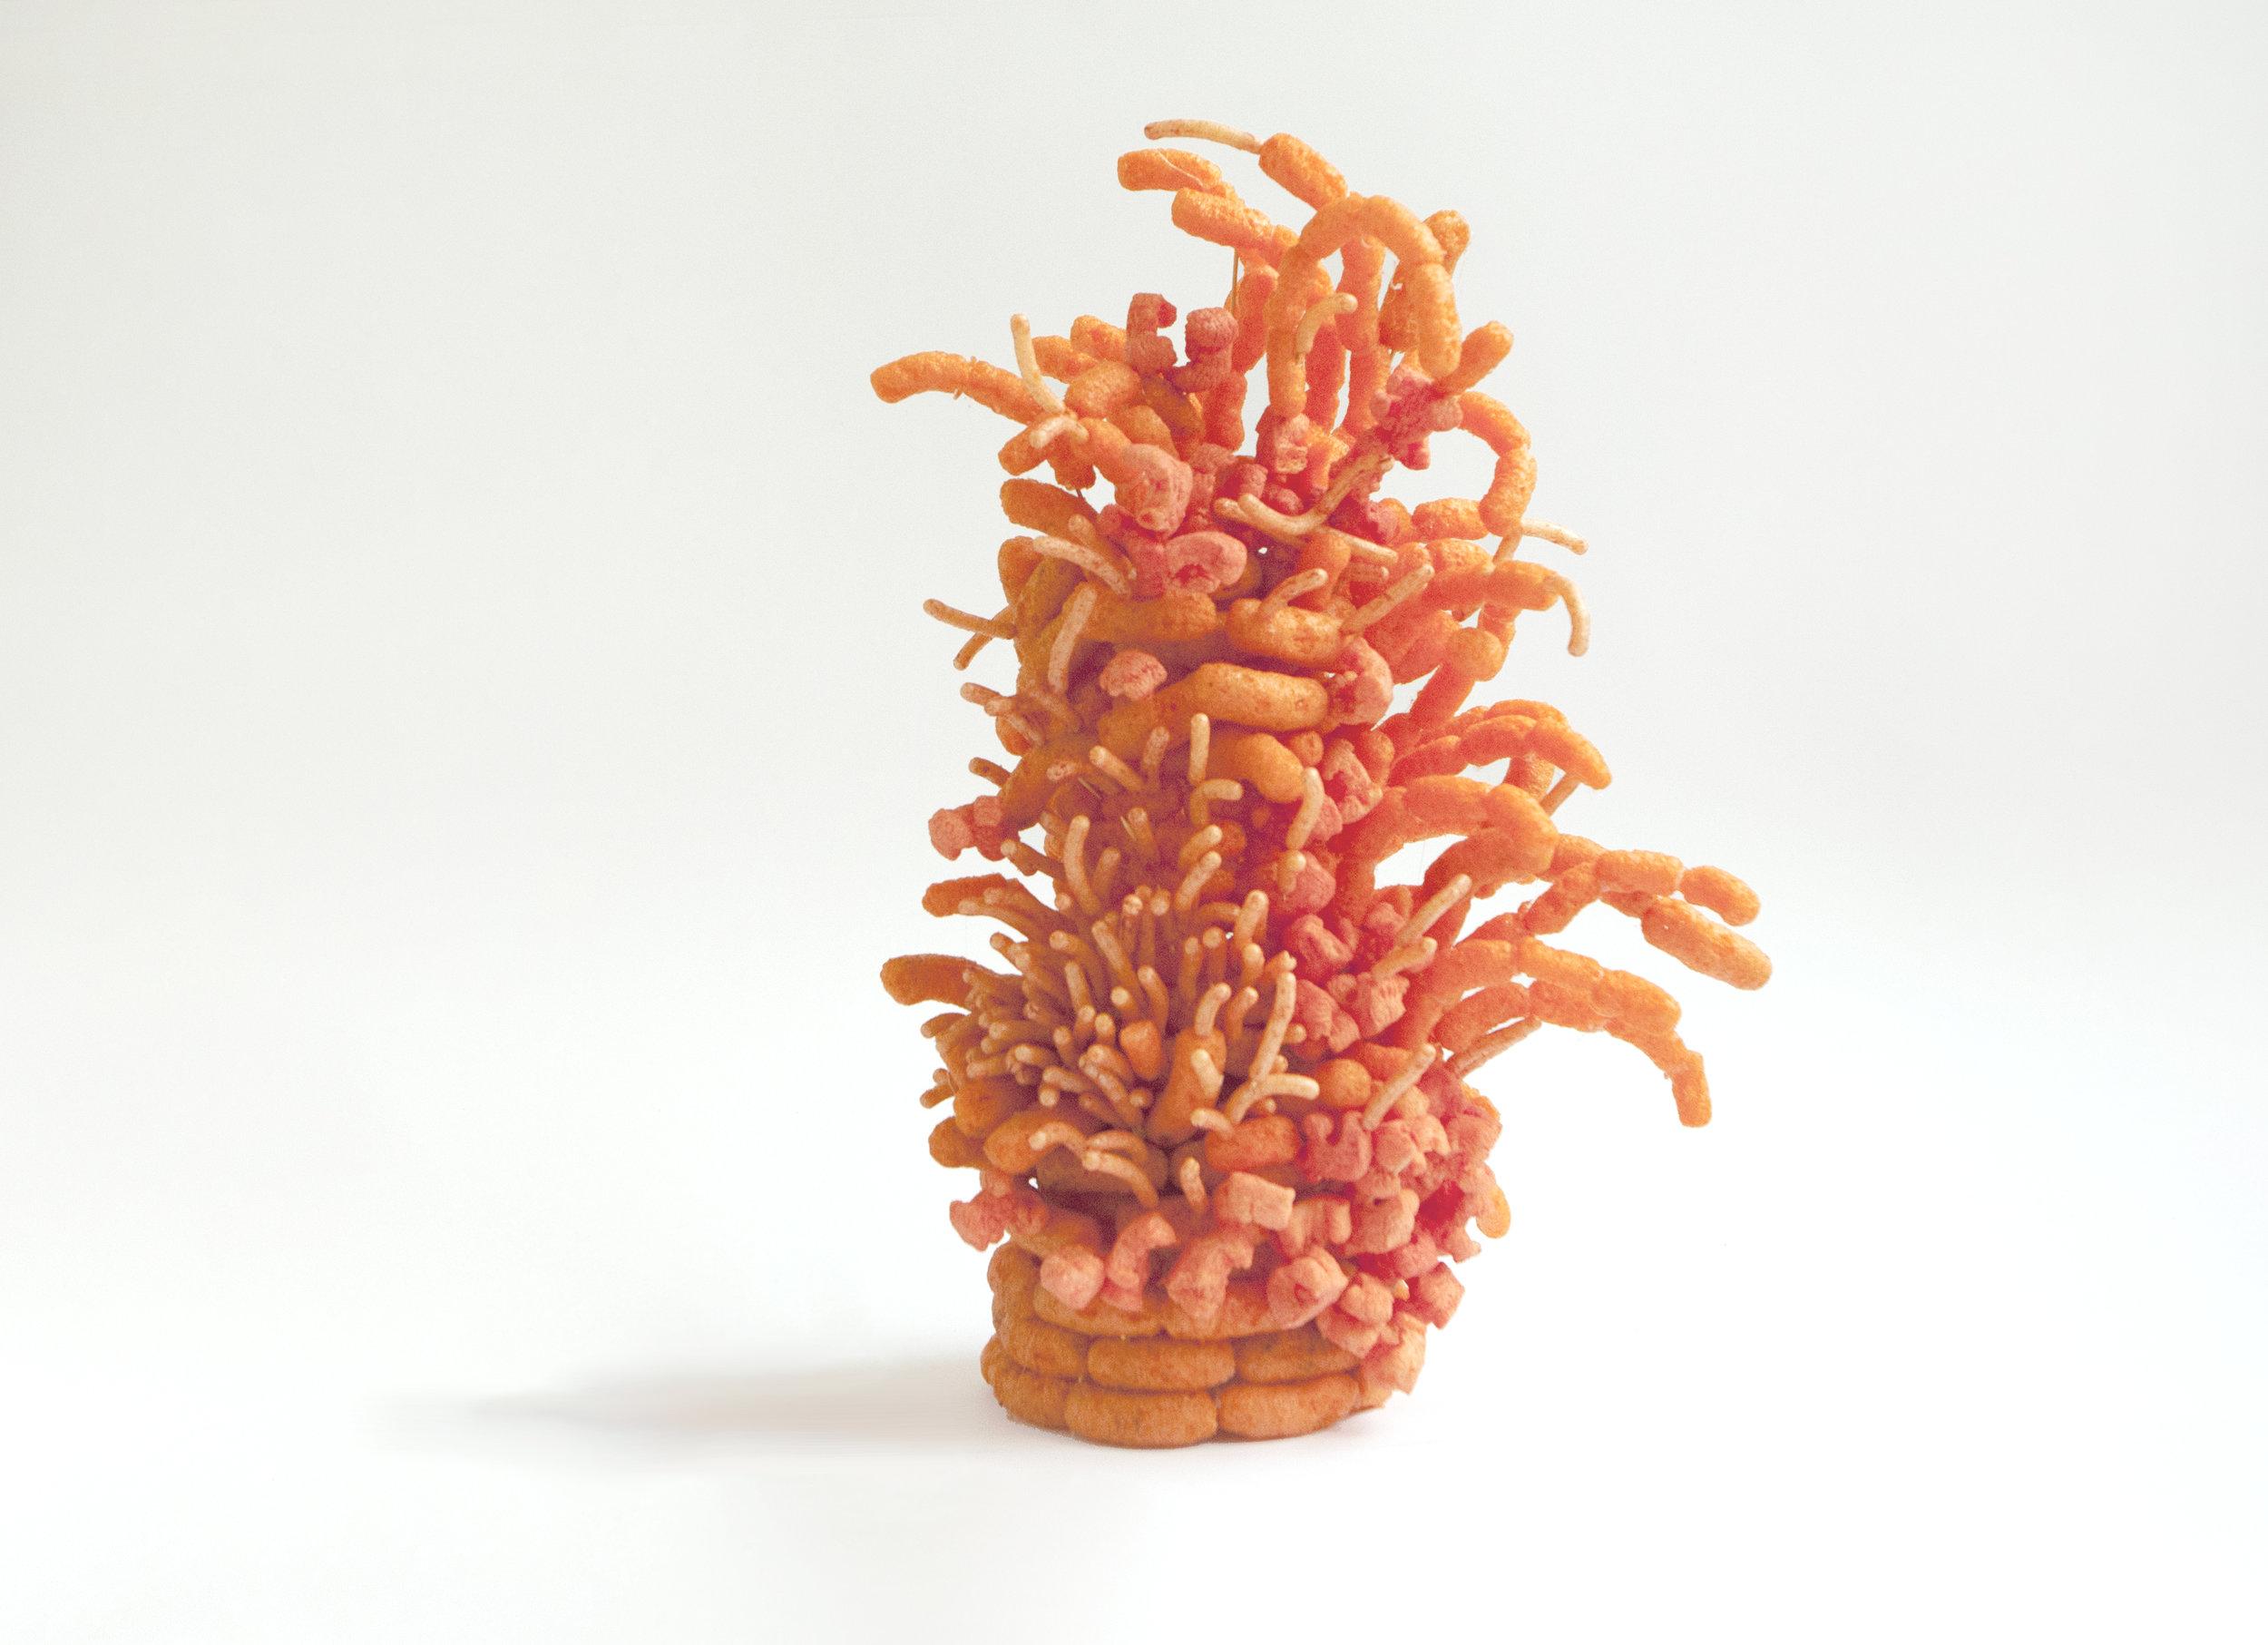 Mano Penalva, Projeto Monumento 2, Cheetos, 2017, Foto, 30 x 40 cm,Mexico